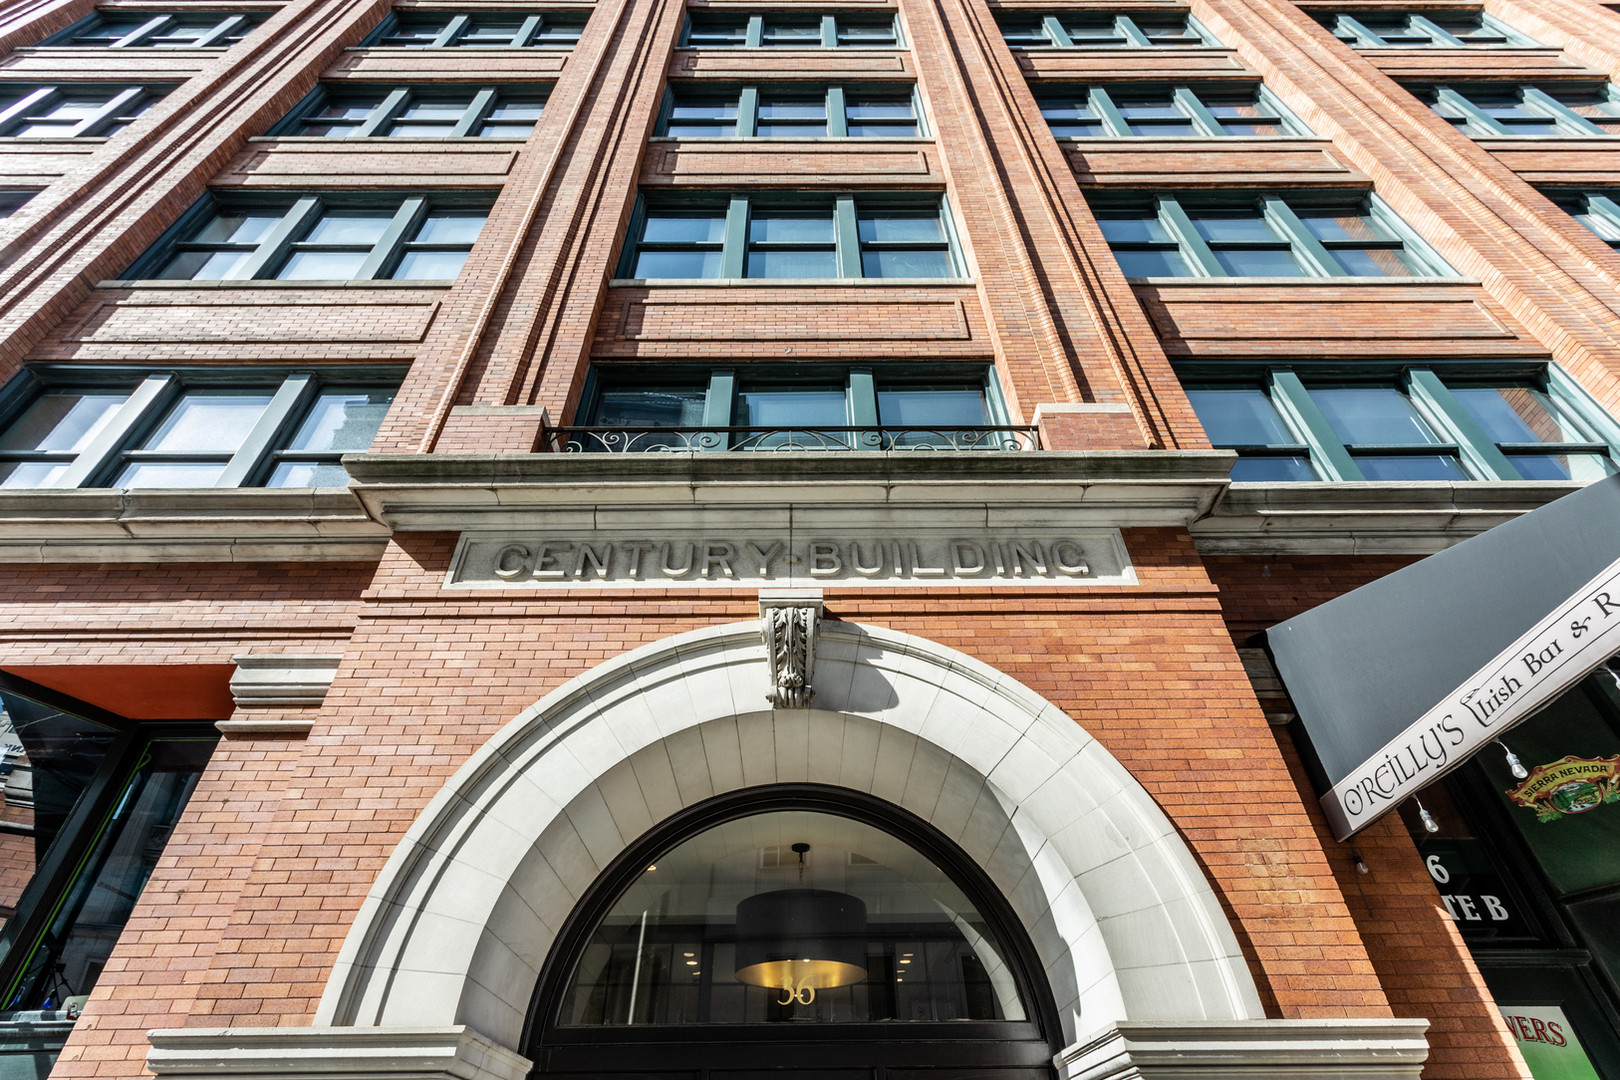 03-(Century Building).jpg